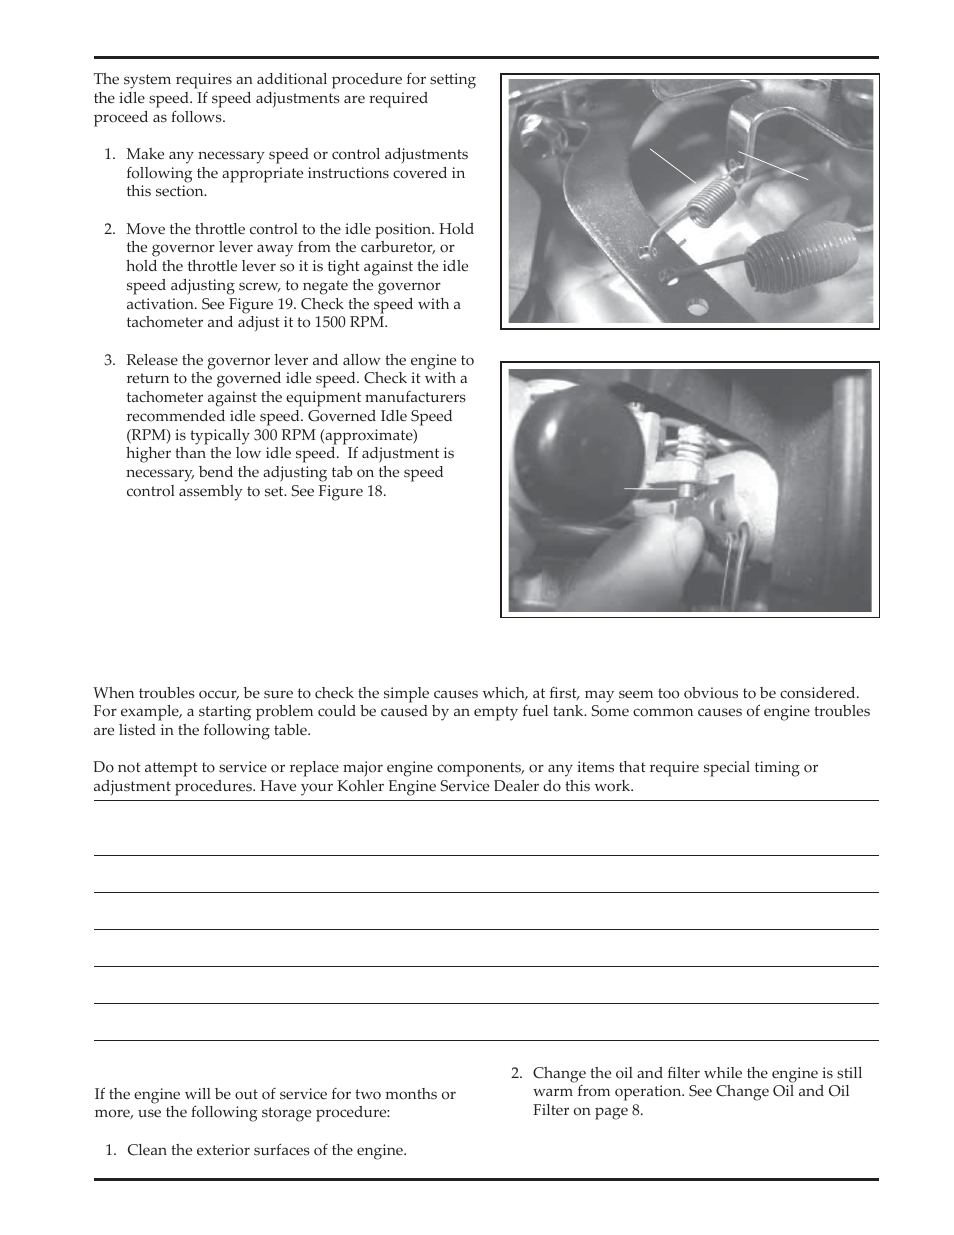 Troubleshooting, Storage | Kohler Courage SV720 User Manual